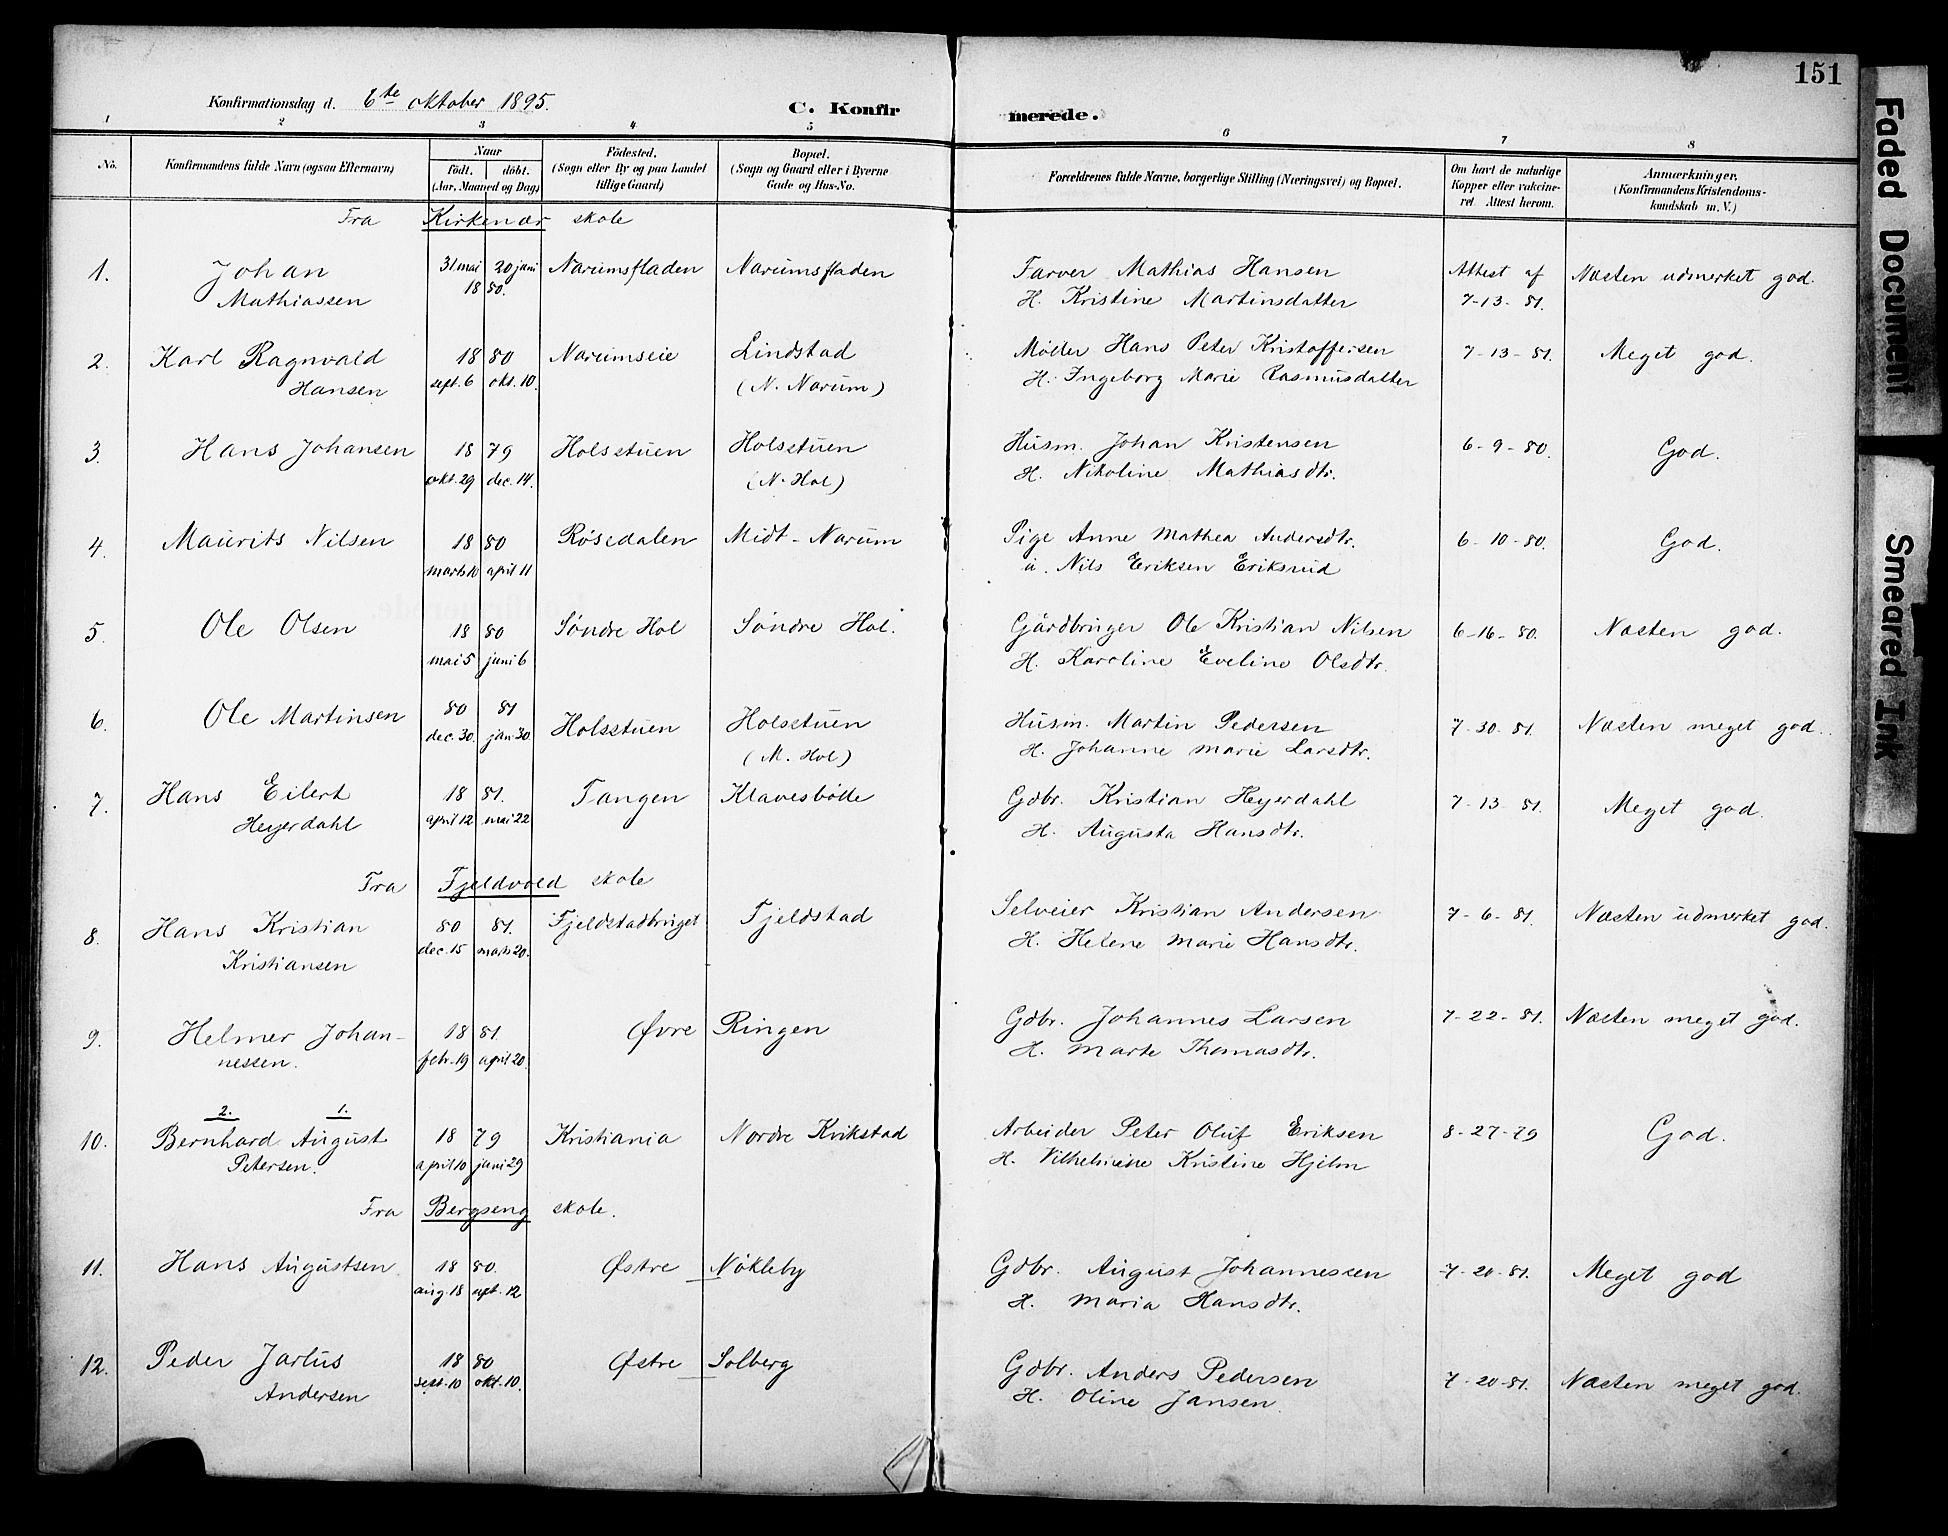 SAH, Vestre Toten prestekontor, H/Ha/Haa/L0013: Ministerialbok nr. 13, 1895-1911, s. 151